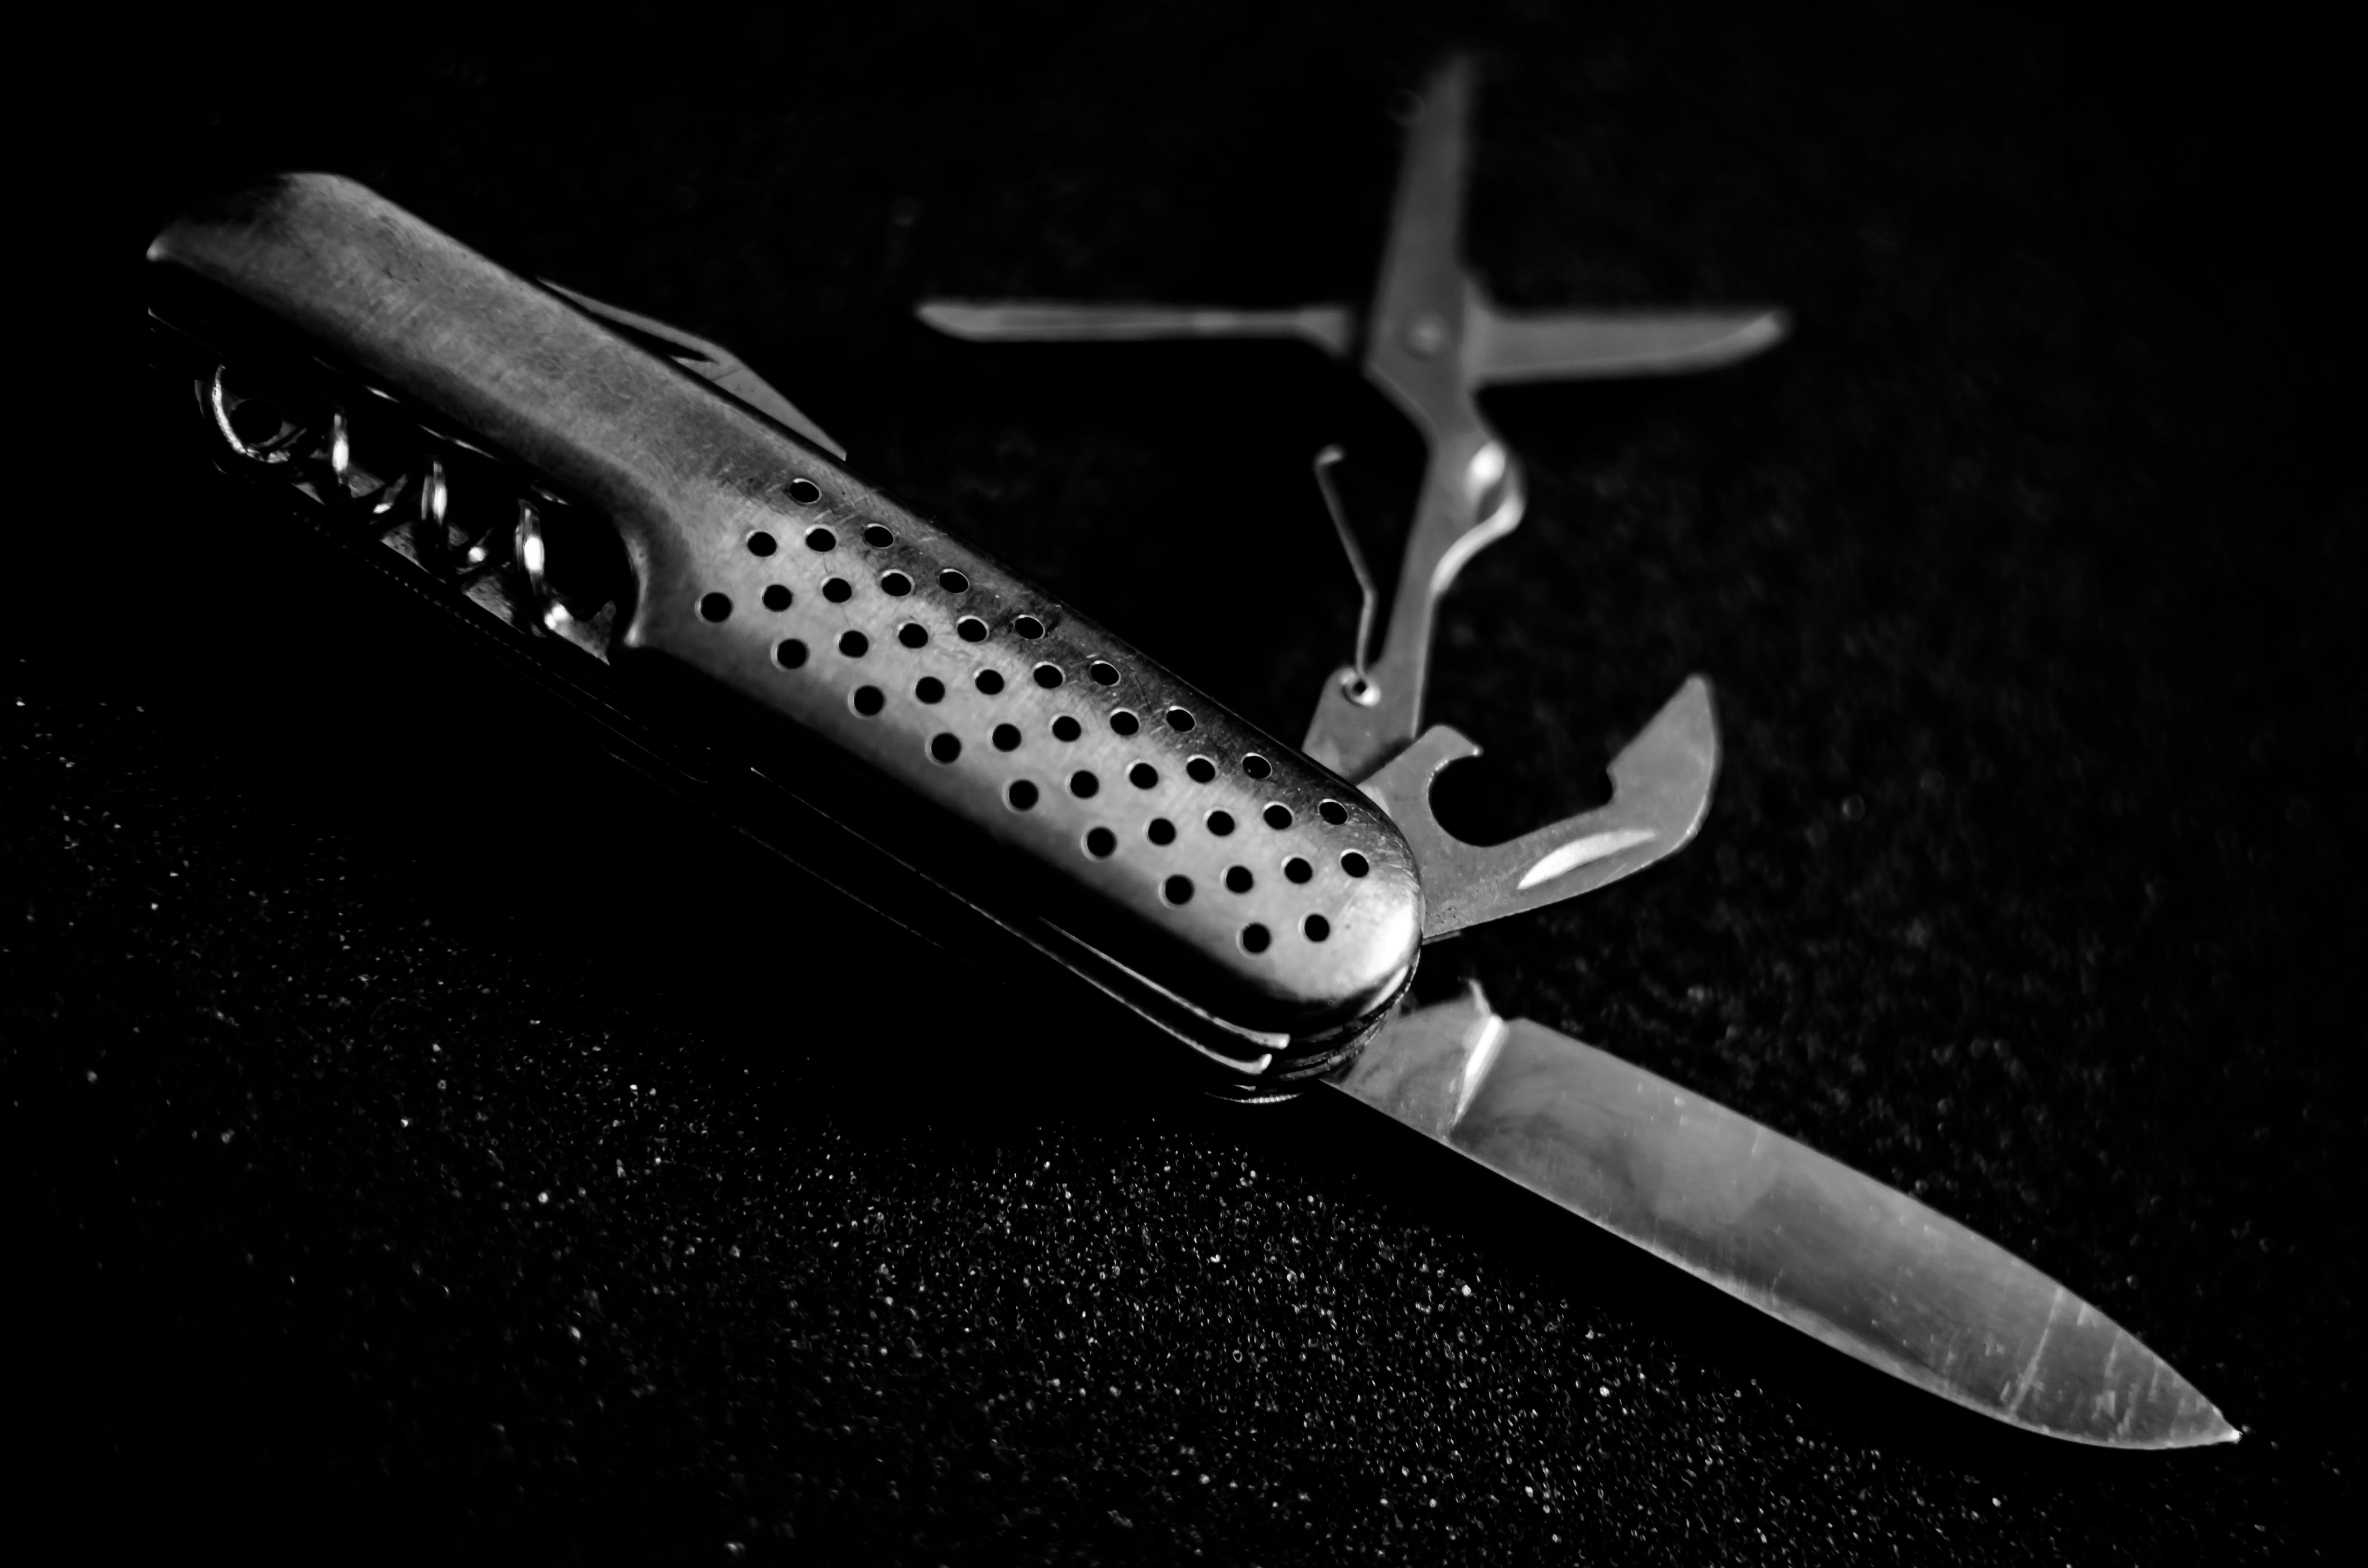 Free stock photo of still, knife, life, swiss